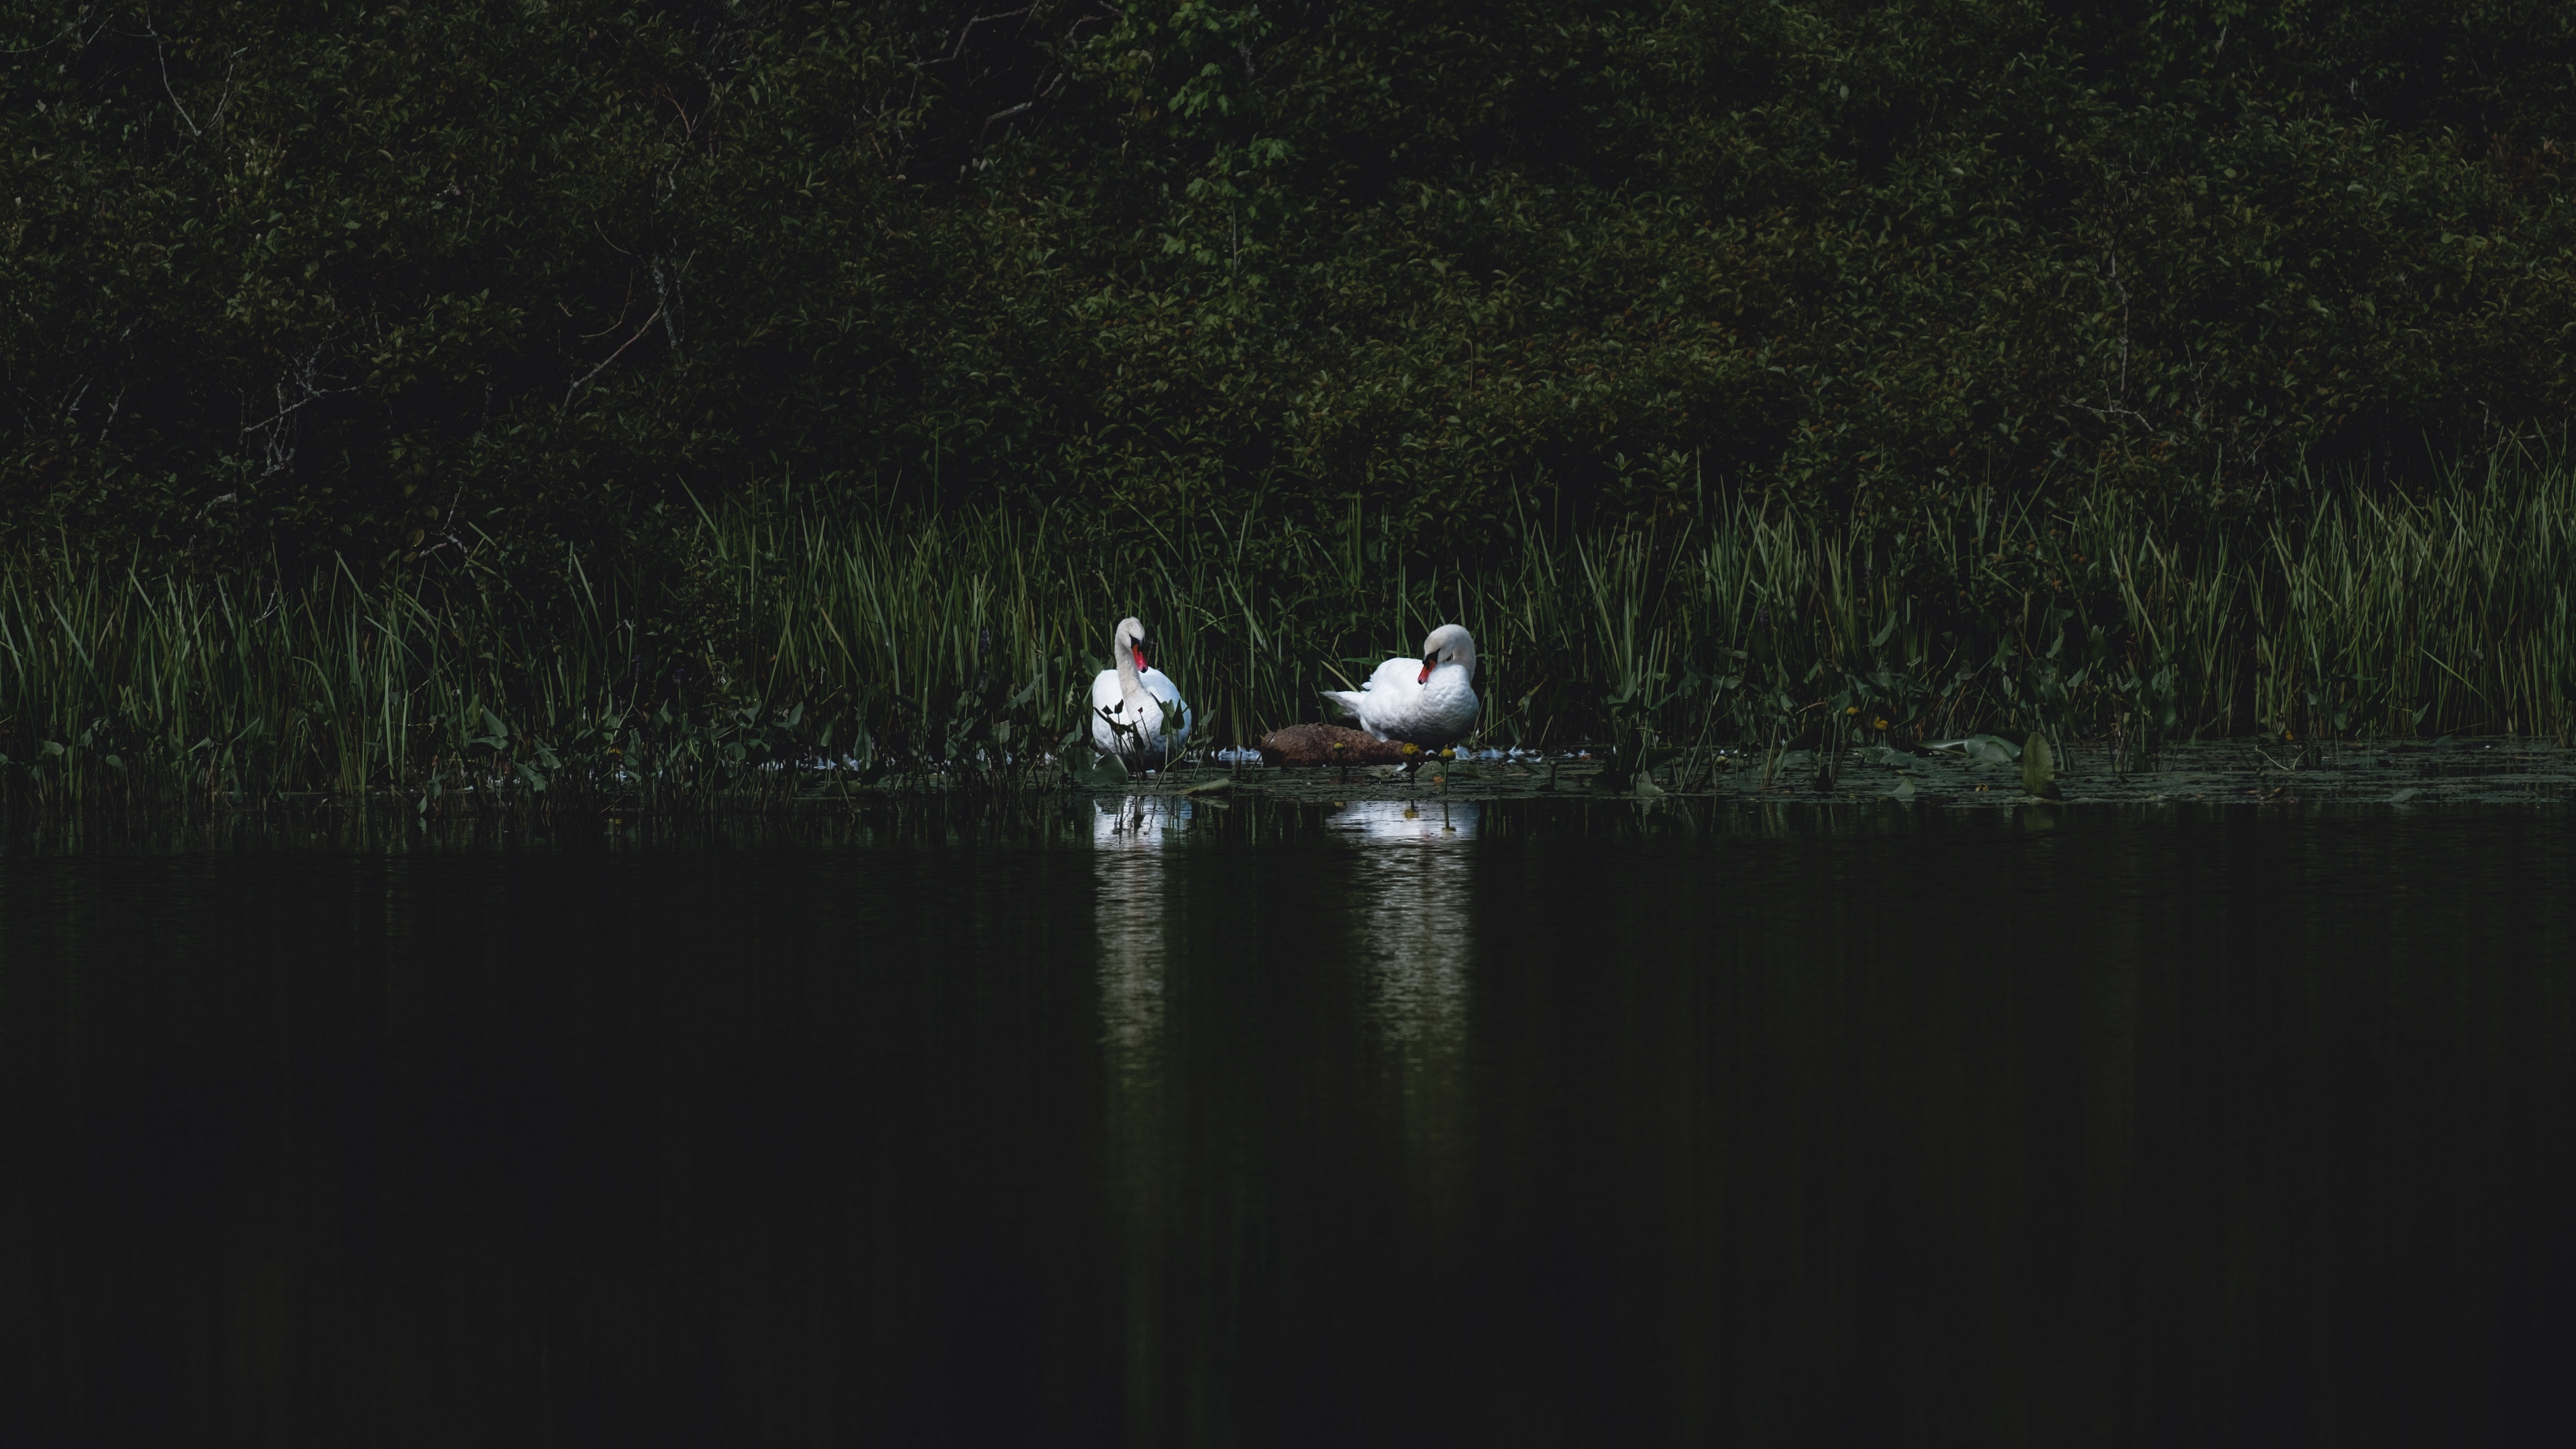 swans bird pond grass 4k 1540574935 - swans, bird, pond, grass 4k - Swans, pond, Bird